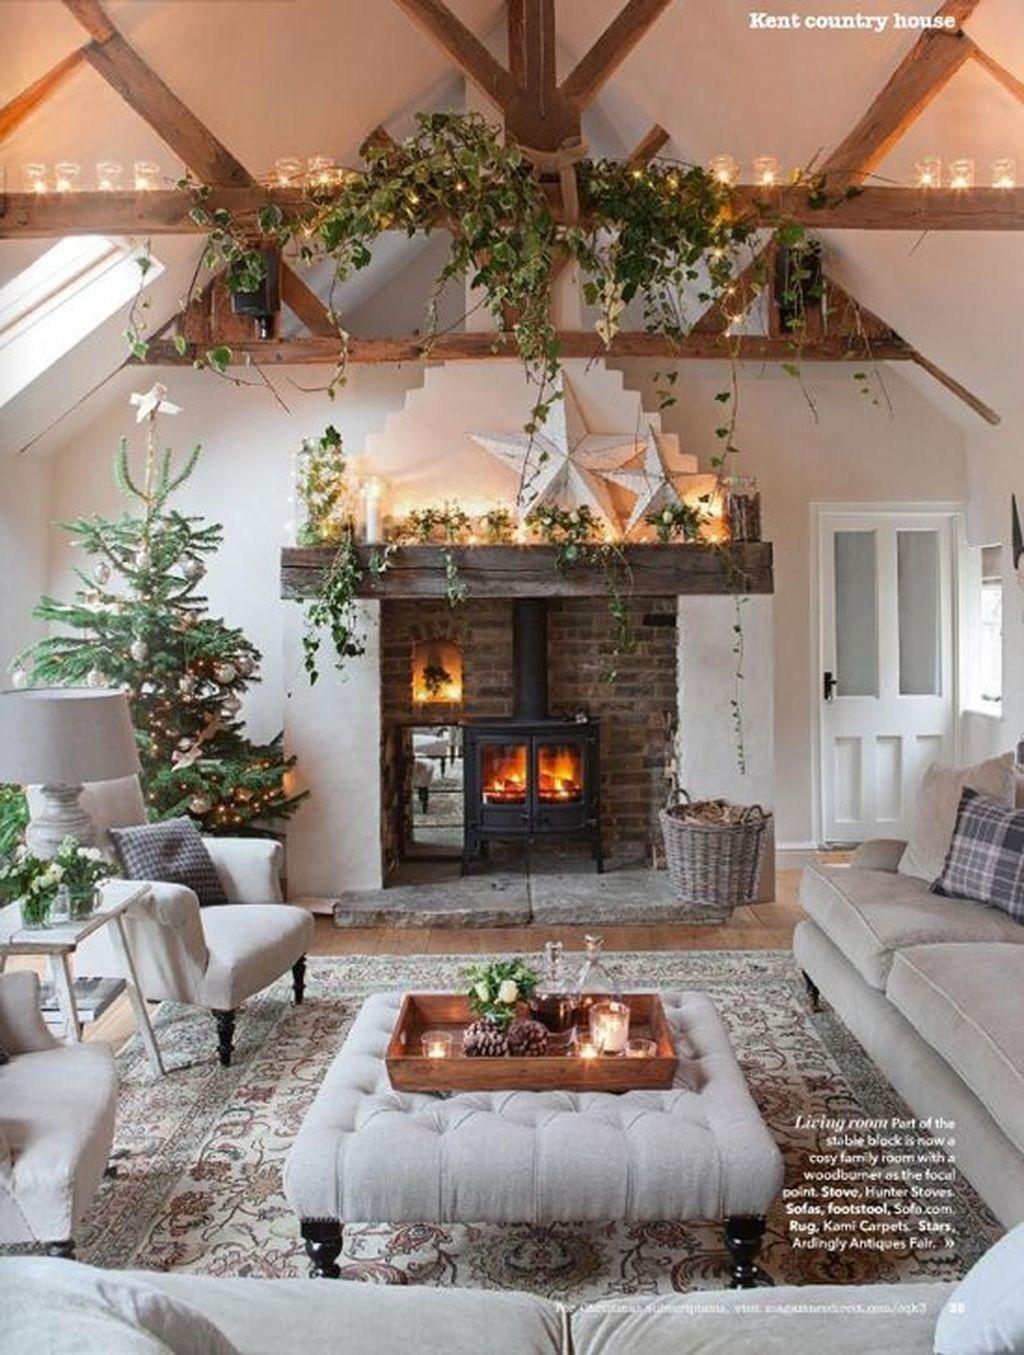 40 cozy chistmas house decorationhomedecorish